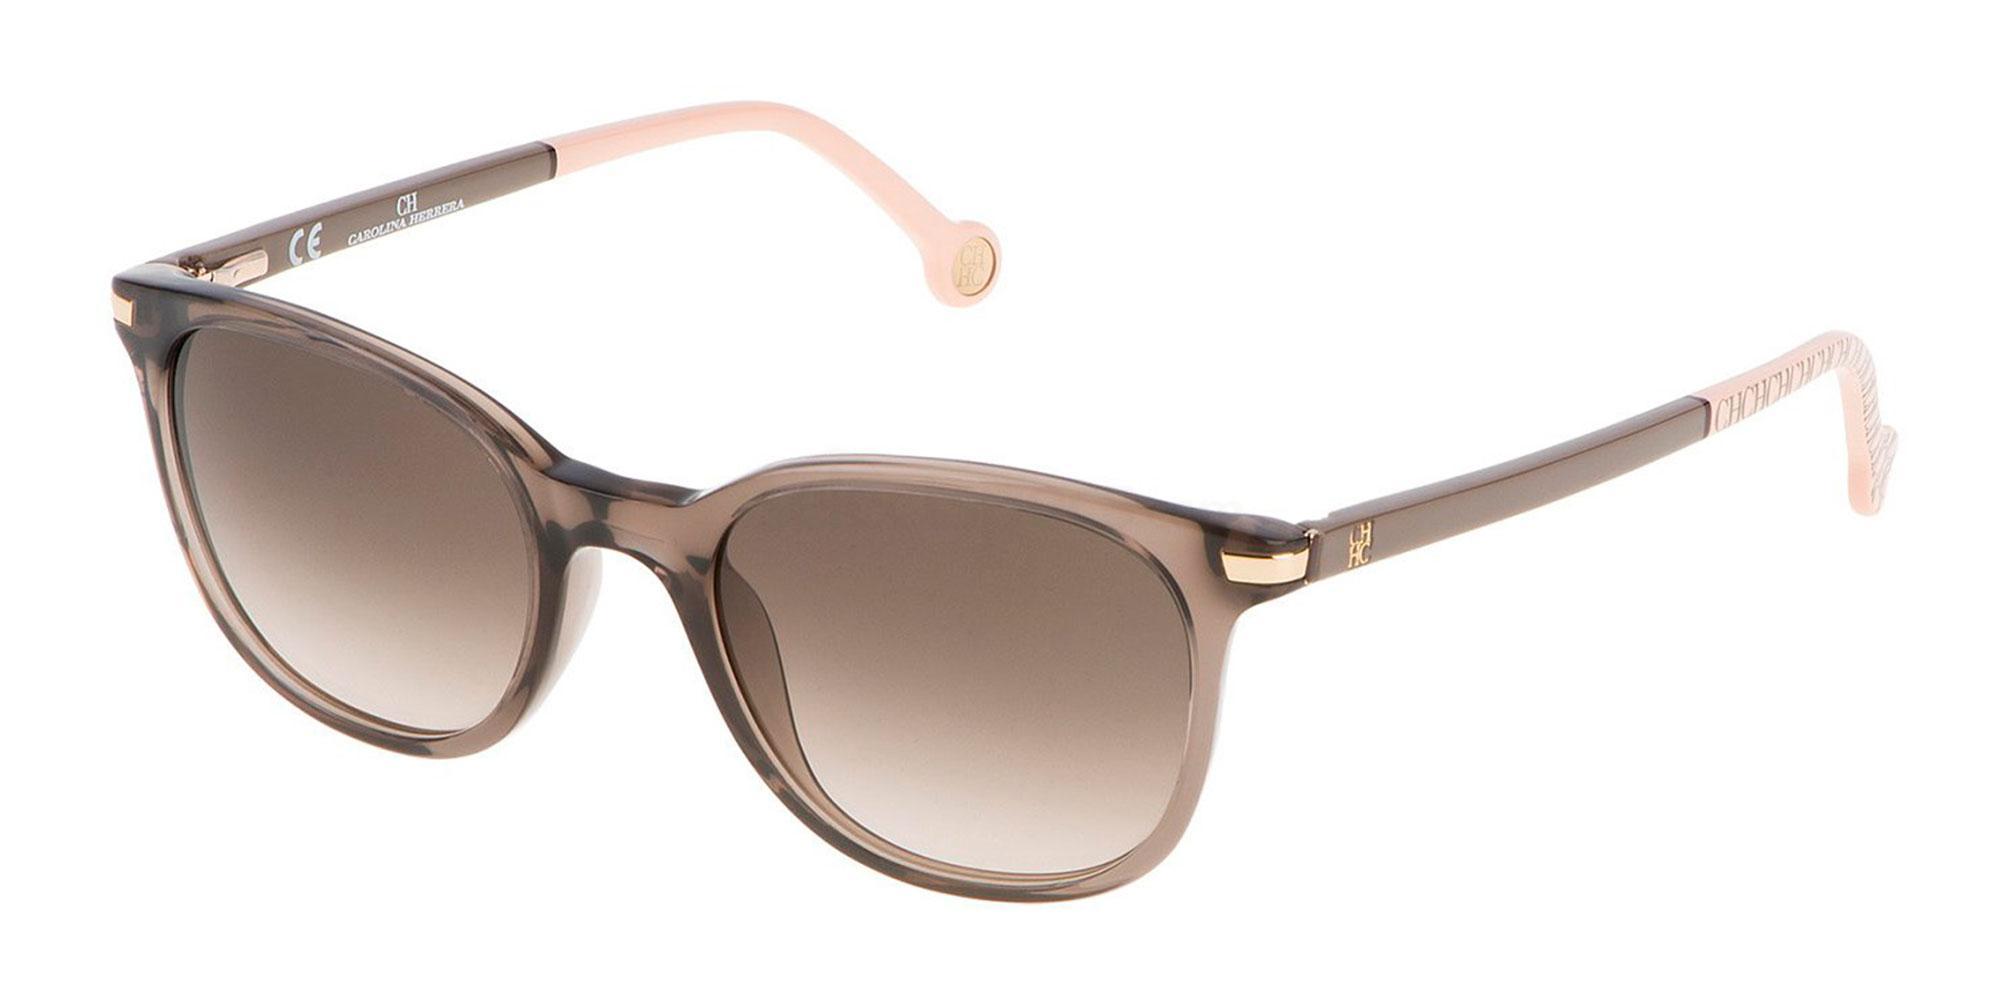 04AL SHE650 Sunglasses, CH Carolina Herrera